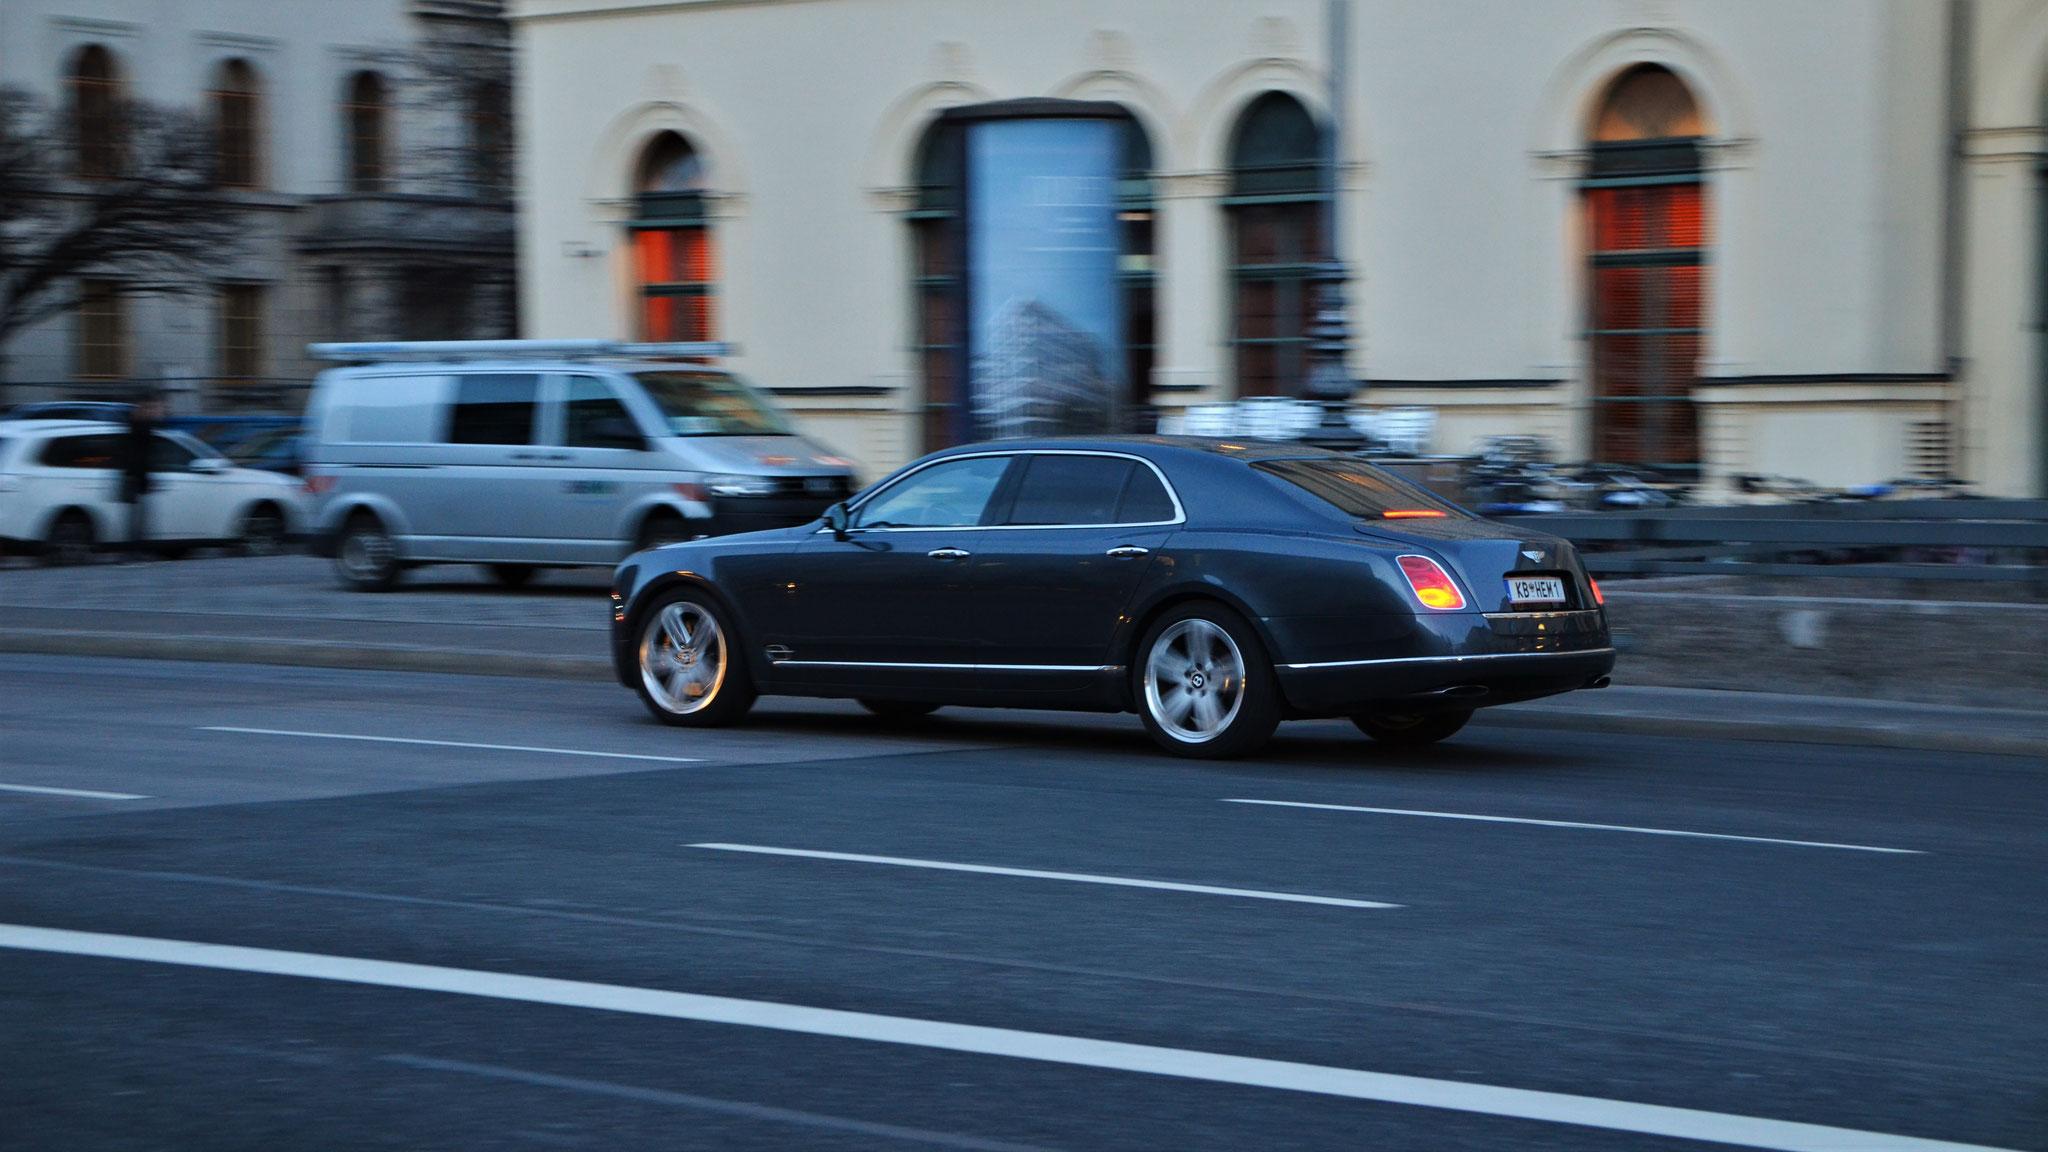 Bentley Mulsanne - KB-HEM-1 (AUT)